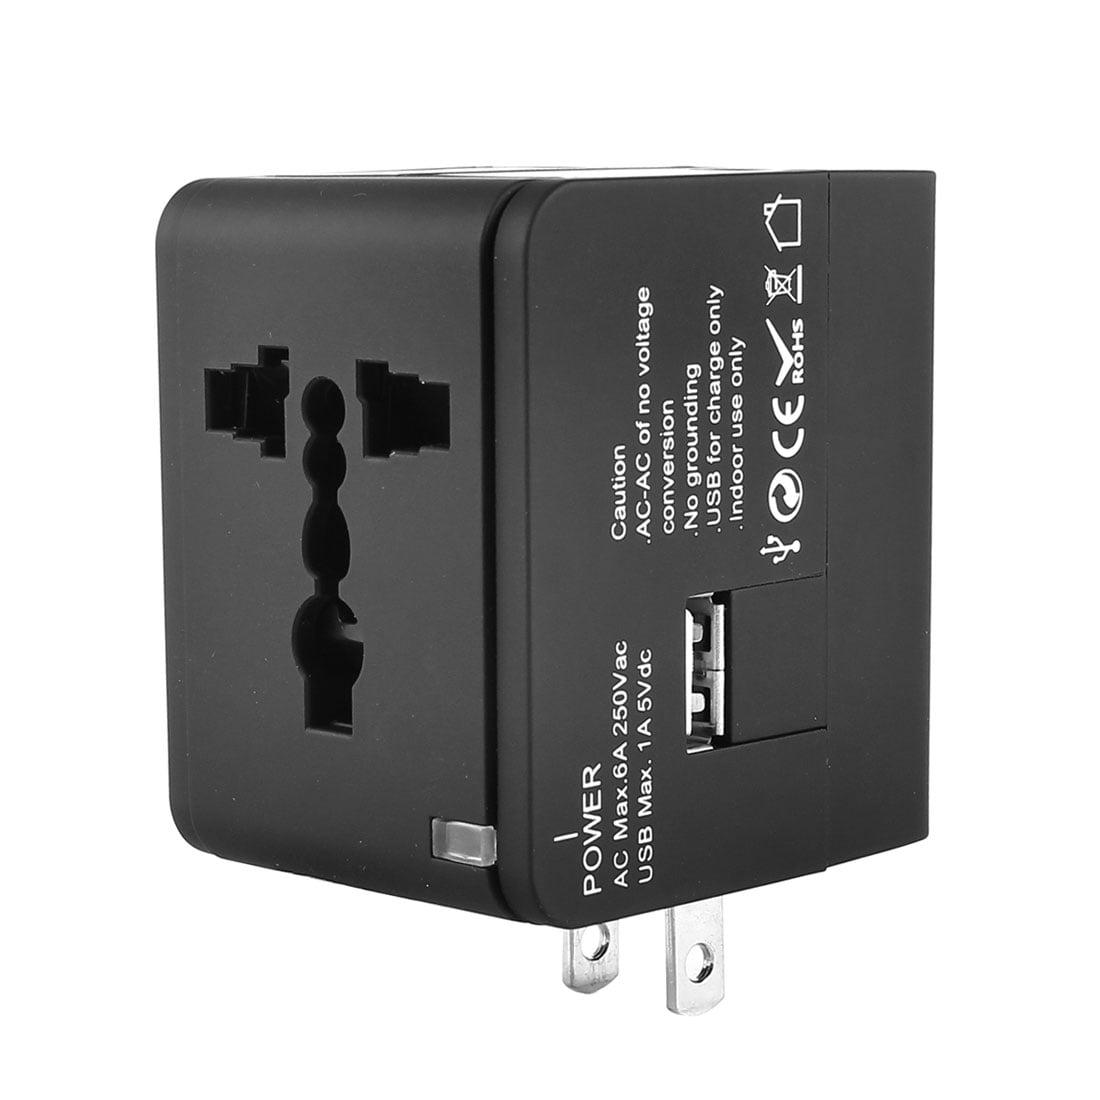 Universal Travel US UK AU EU Charger Travel Adapter AC Power Plug w USB Port